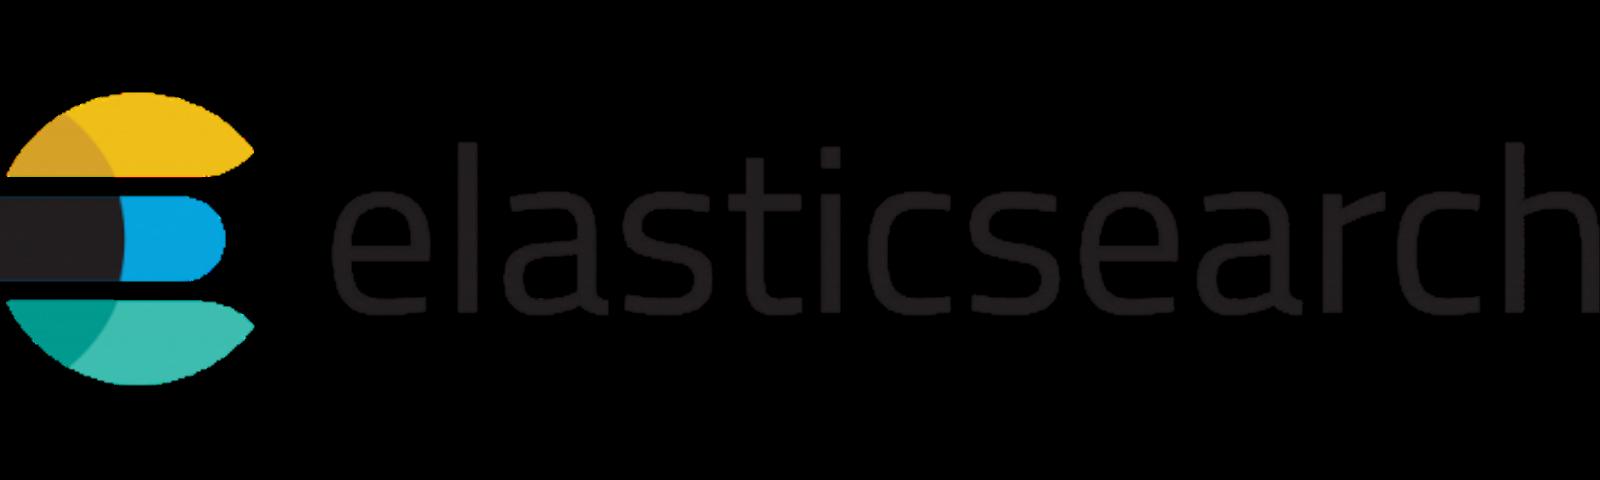 Partner - Elasticsearch Logo